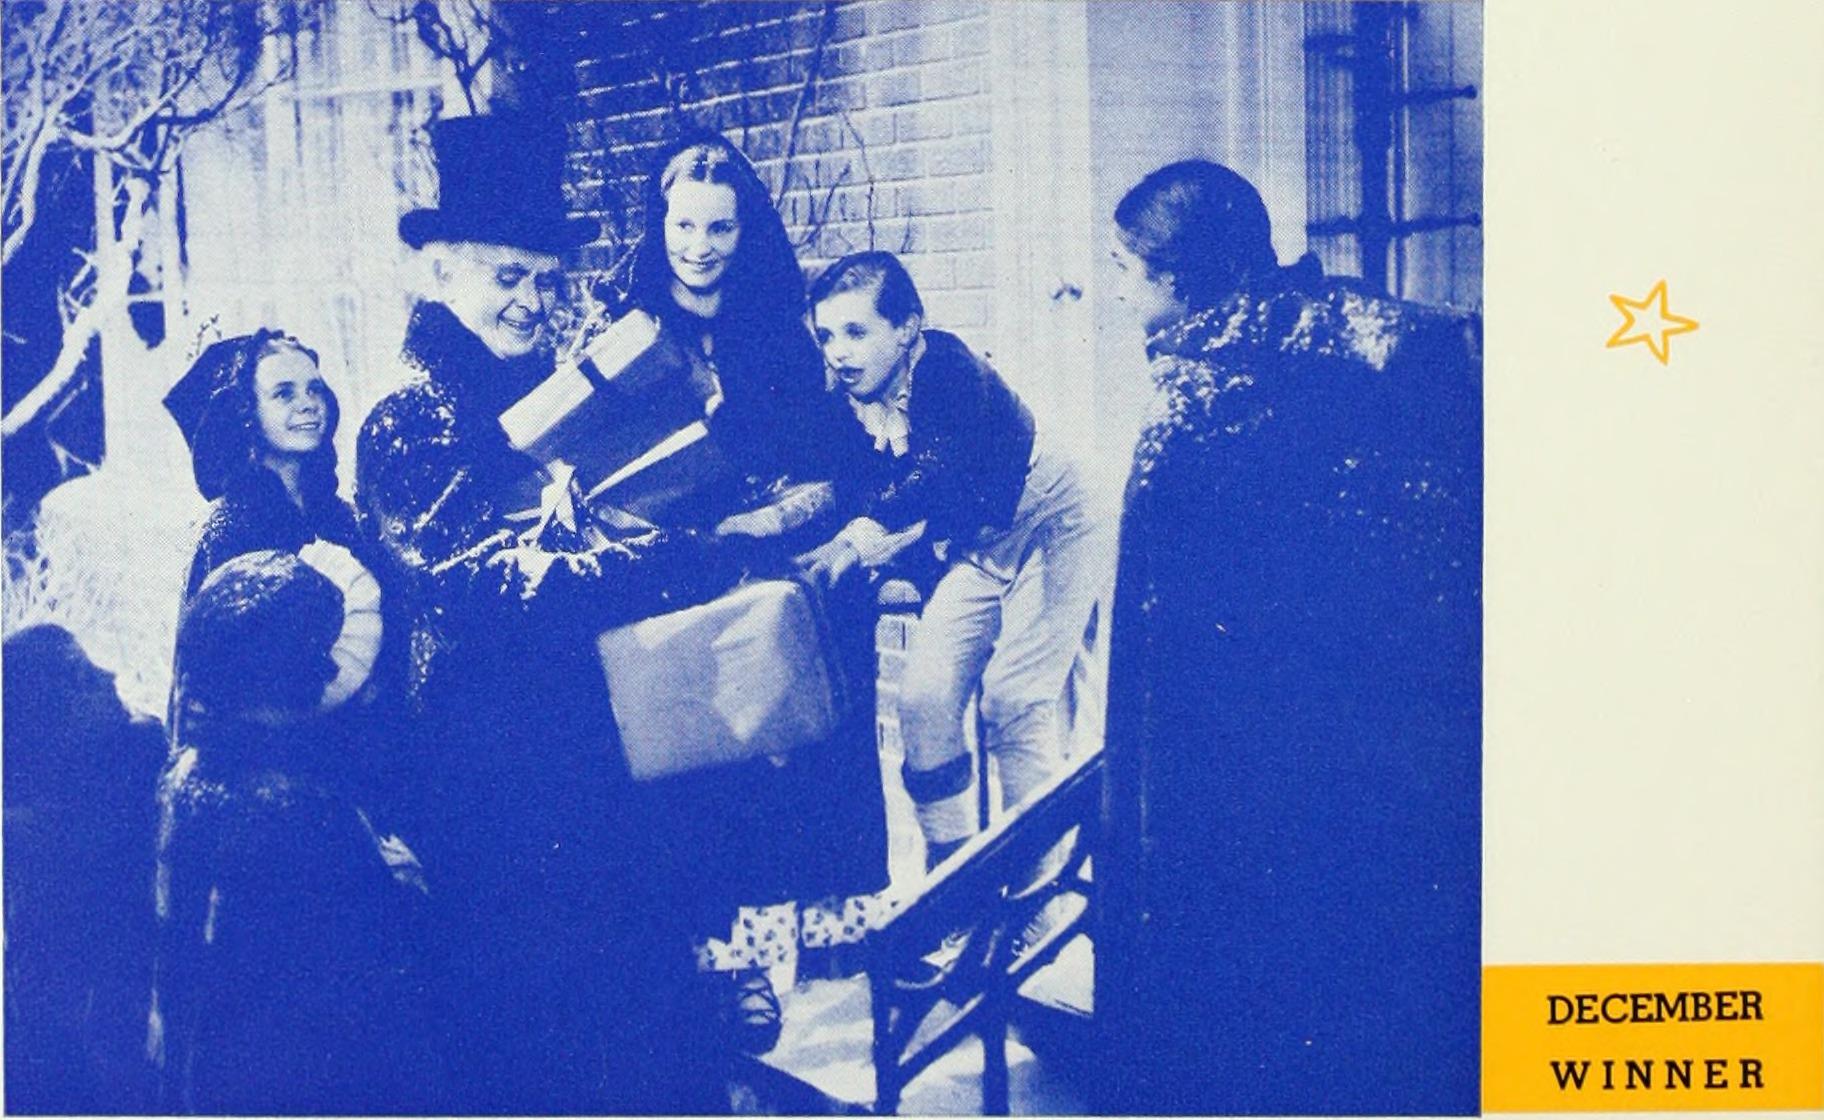 File:A Christmas Carol 1938.jpg - Wikimedia Commons